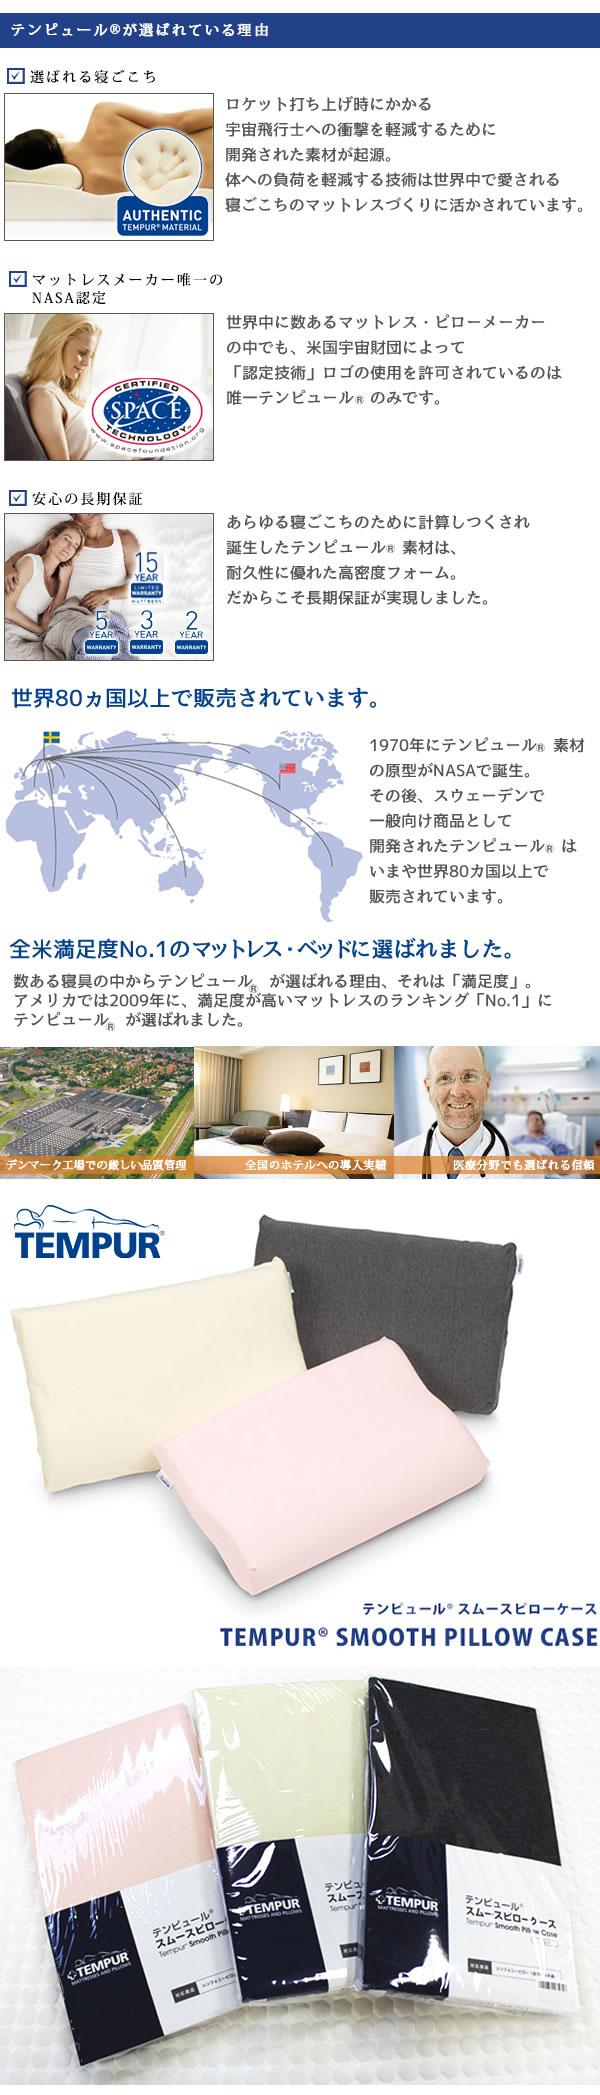 TEMPUR テンピュール スムースピロケース(ネックピロー・ミレニアムピロー対応)